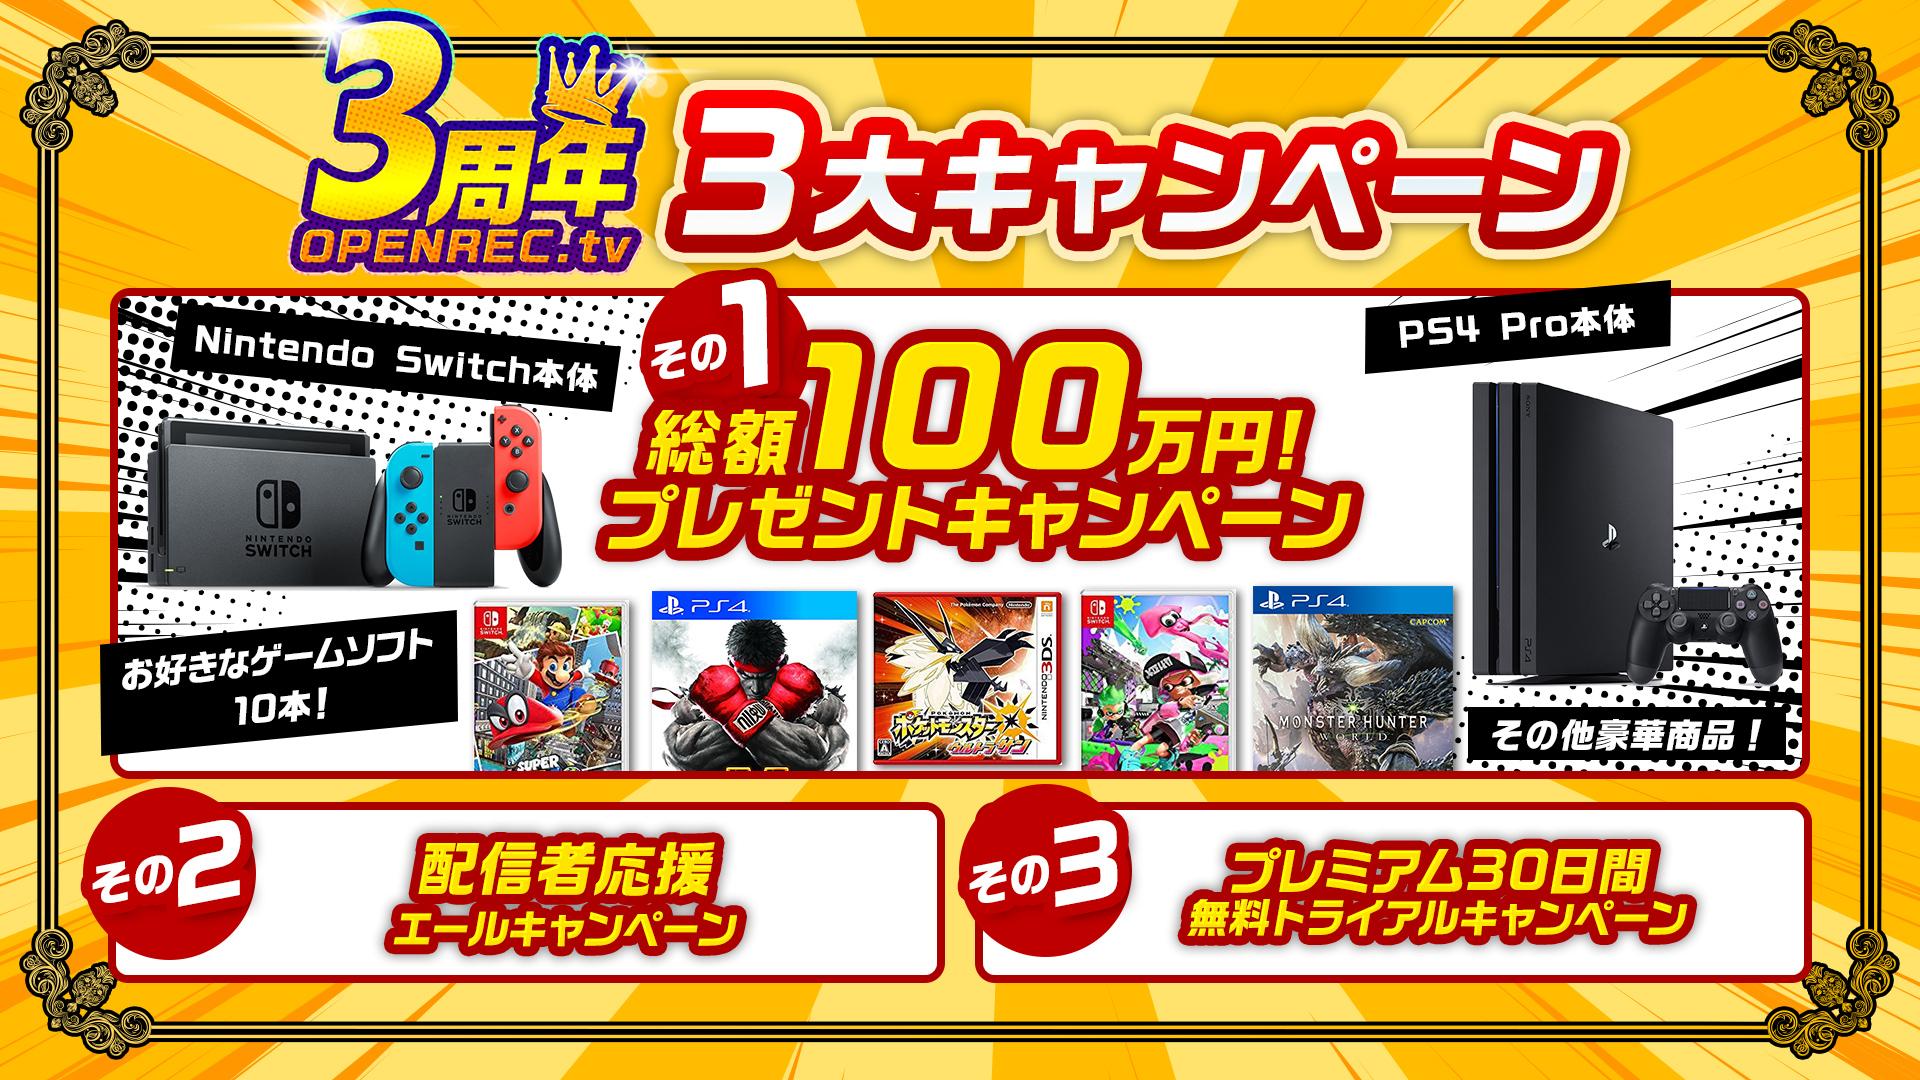 OPENREC.tv 3周年記念!総額100万円分の商品が抽選で当たるキャンペーンなど豪華3大キャンペーンを開催!